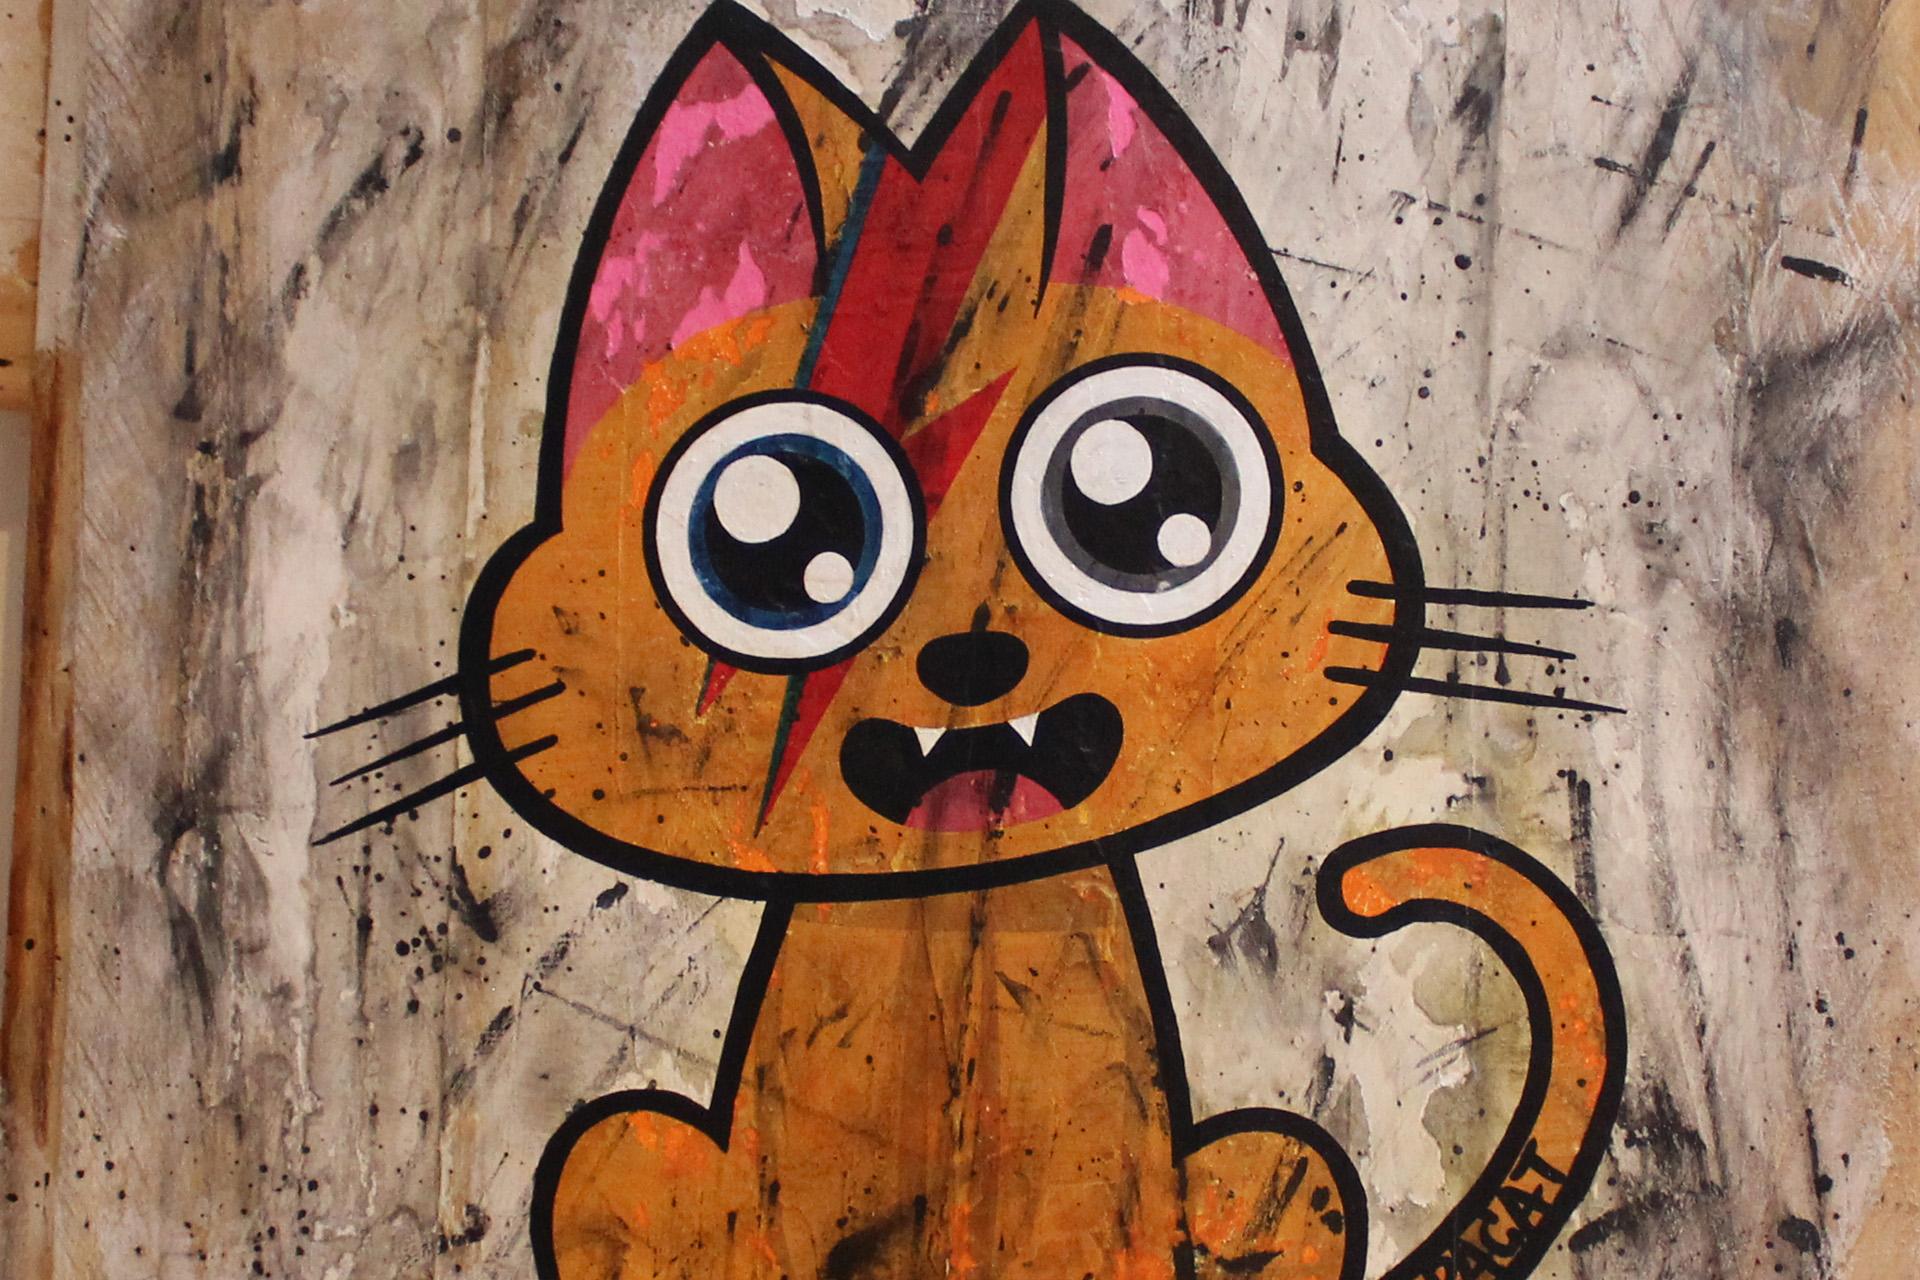 Supacat Street Art Strasbourg - Tableau Ziggy Catdust #2 - Dirty Special